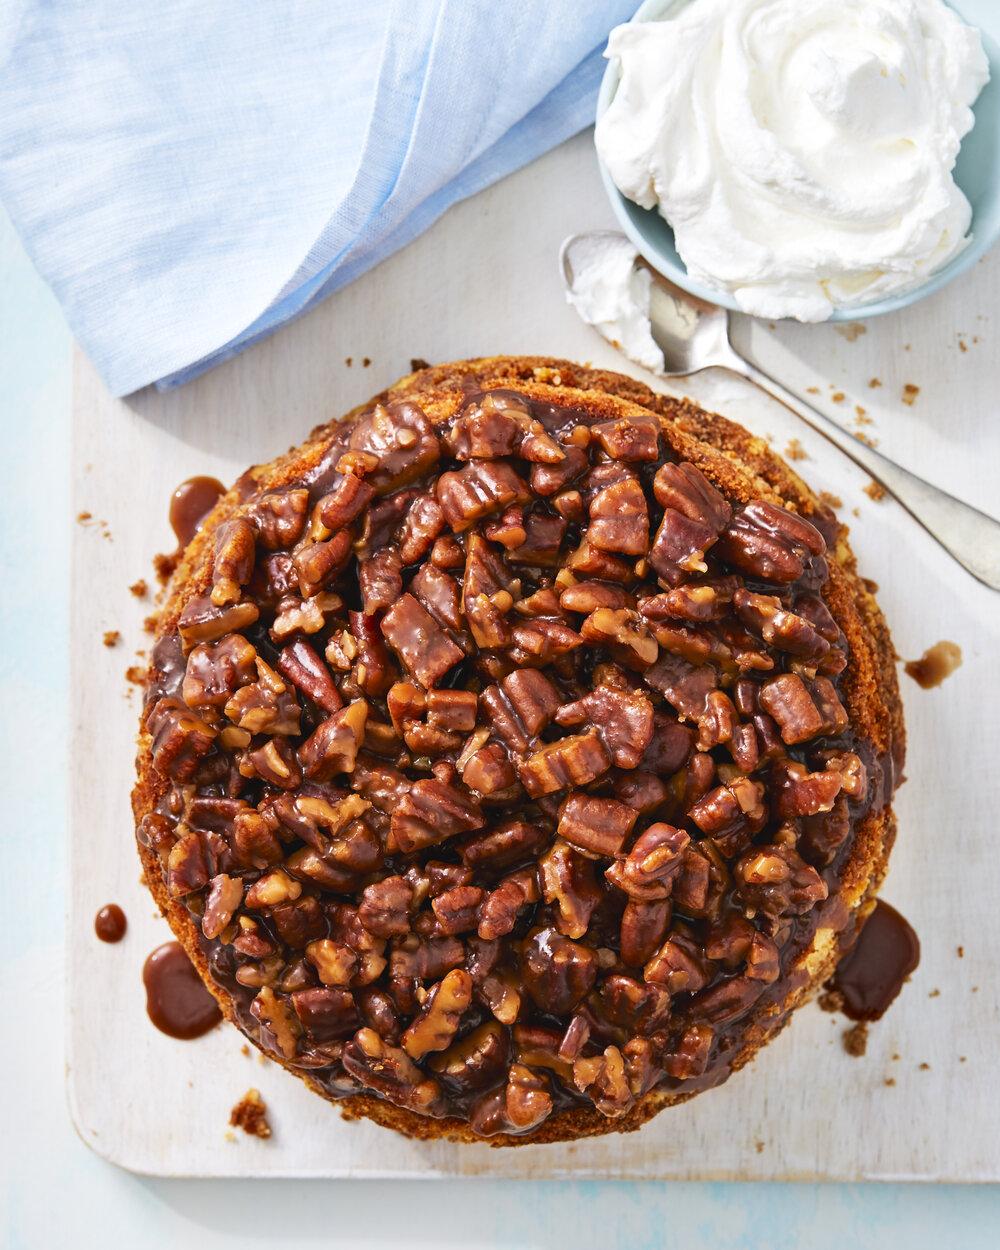 KITC_SWEETS_Cinnamon-Pecan Coffee Cake_4177.jpg